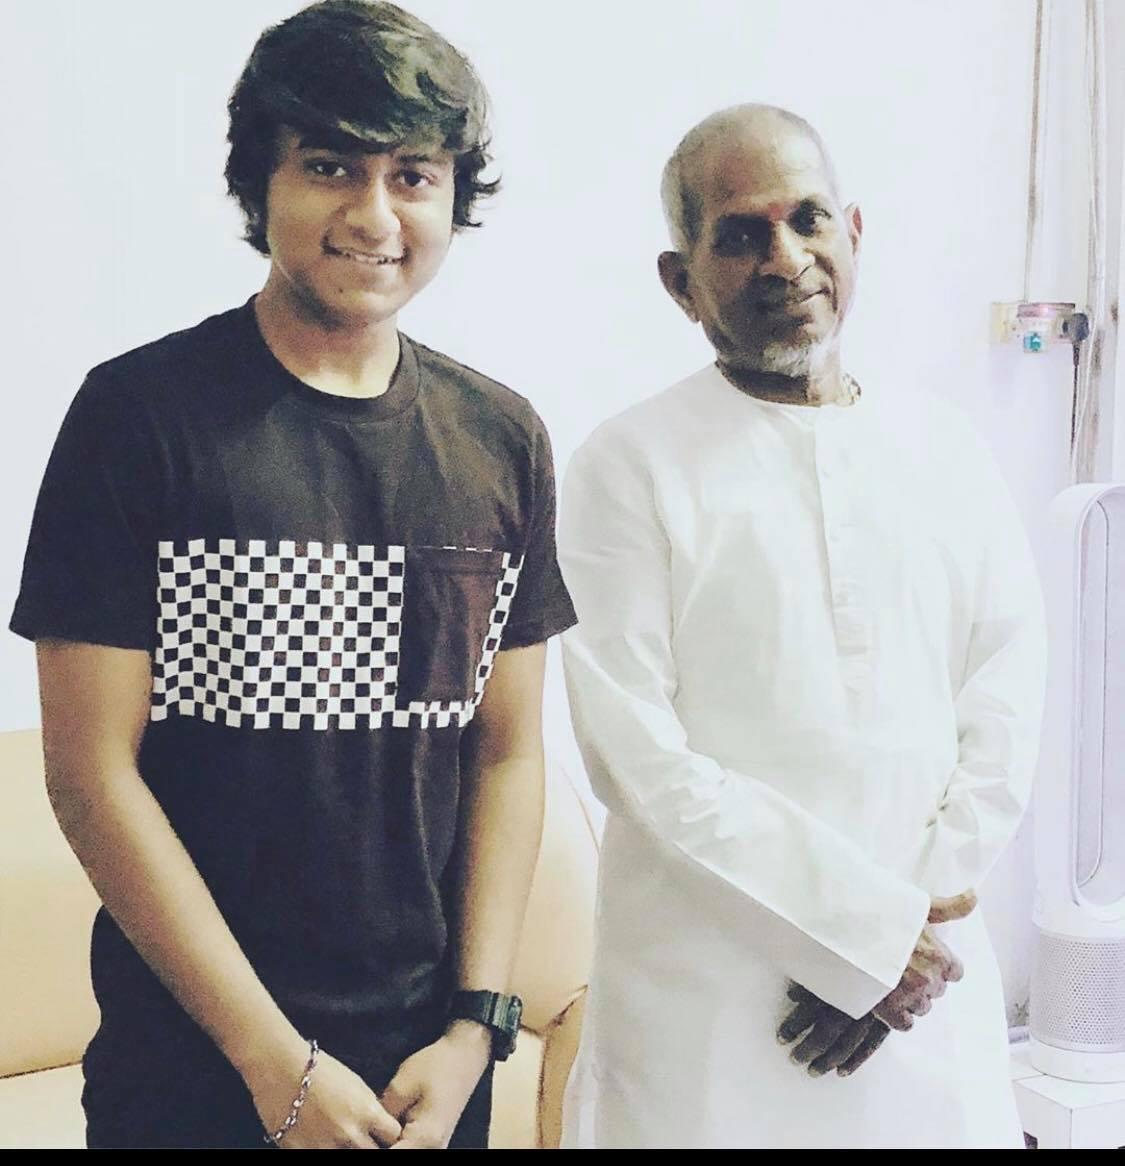 Aajeedh Khalique with his music guru